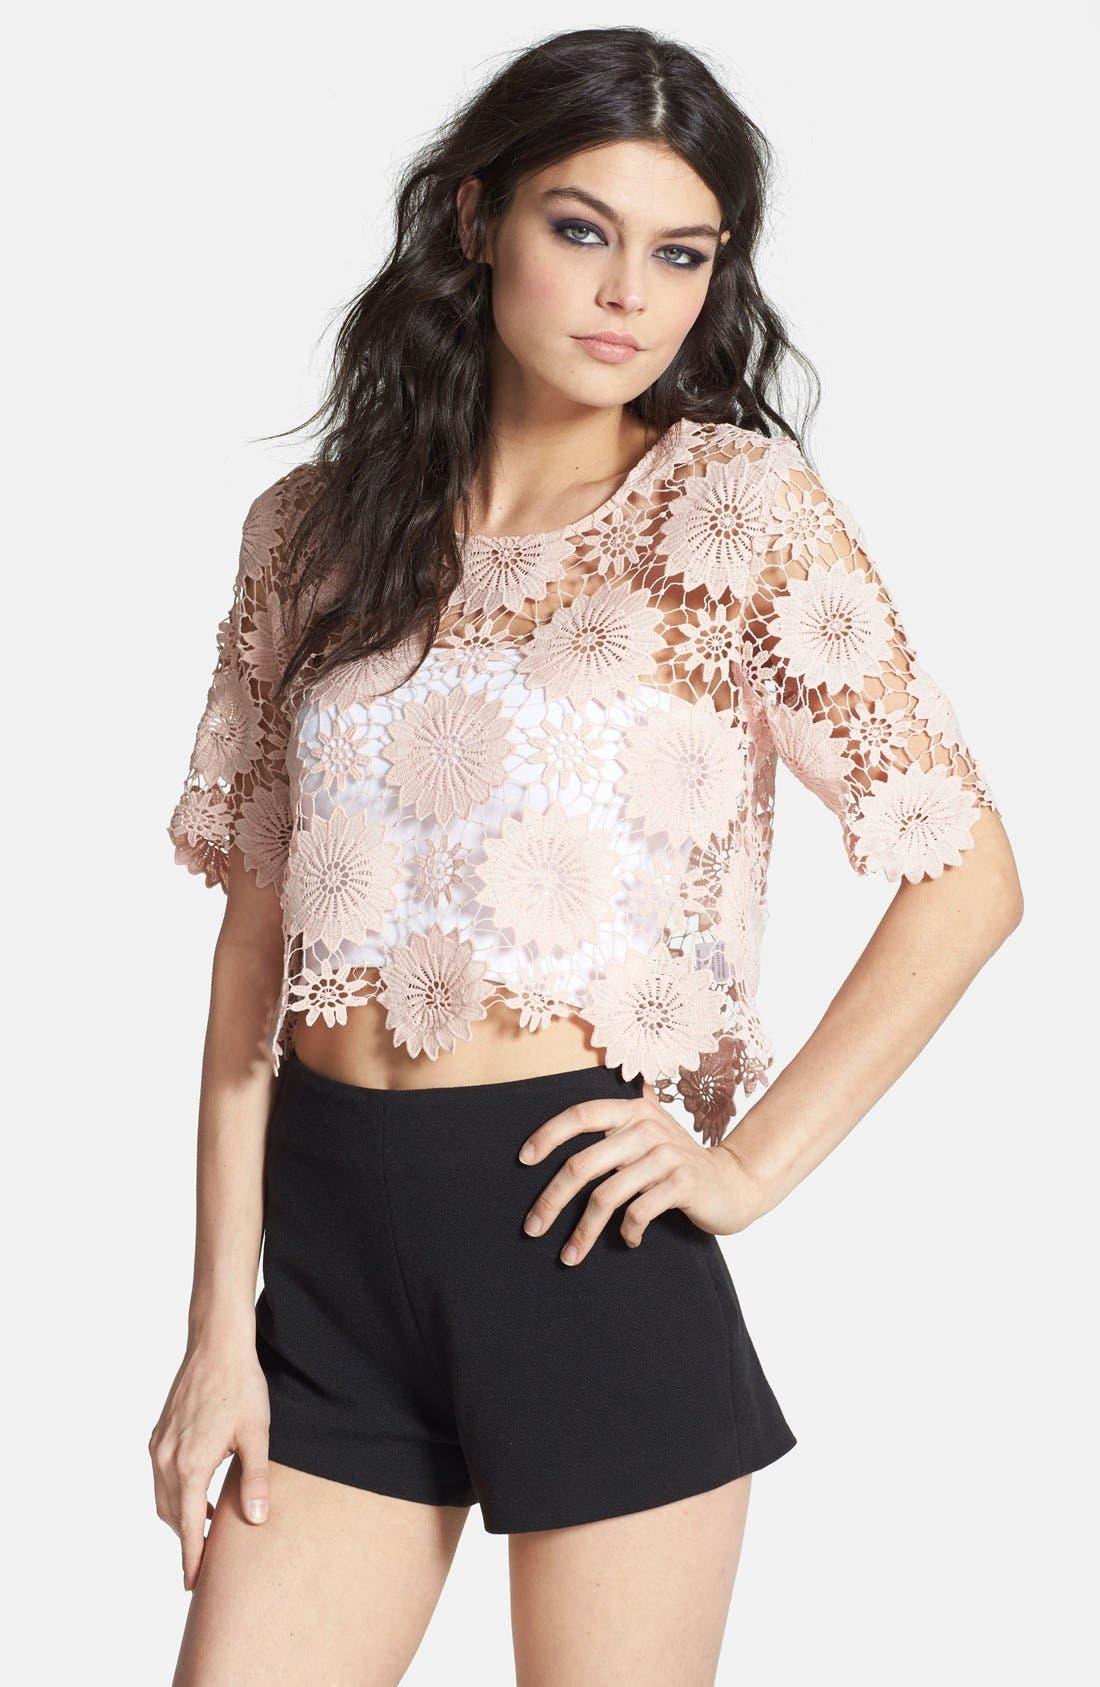 Alternate Image 1 Selected - ASTR Crocheted Floral Crop Top